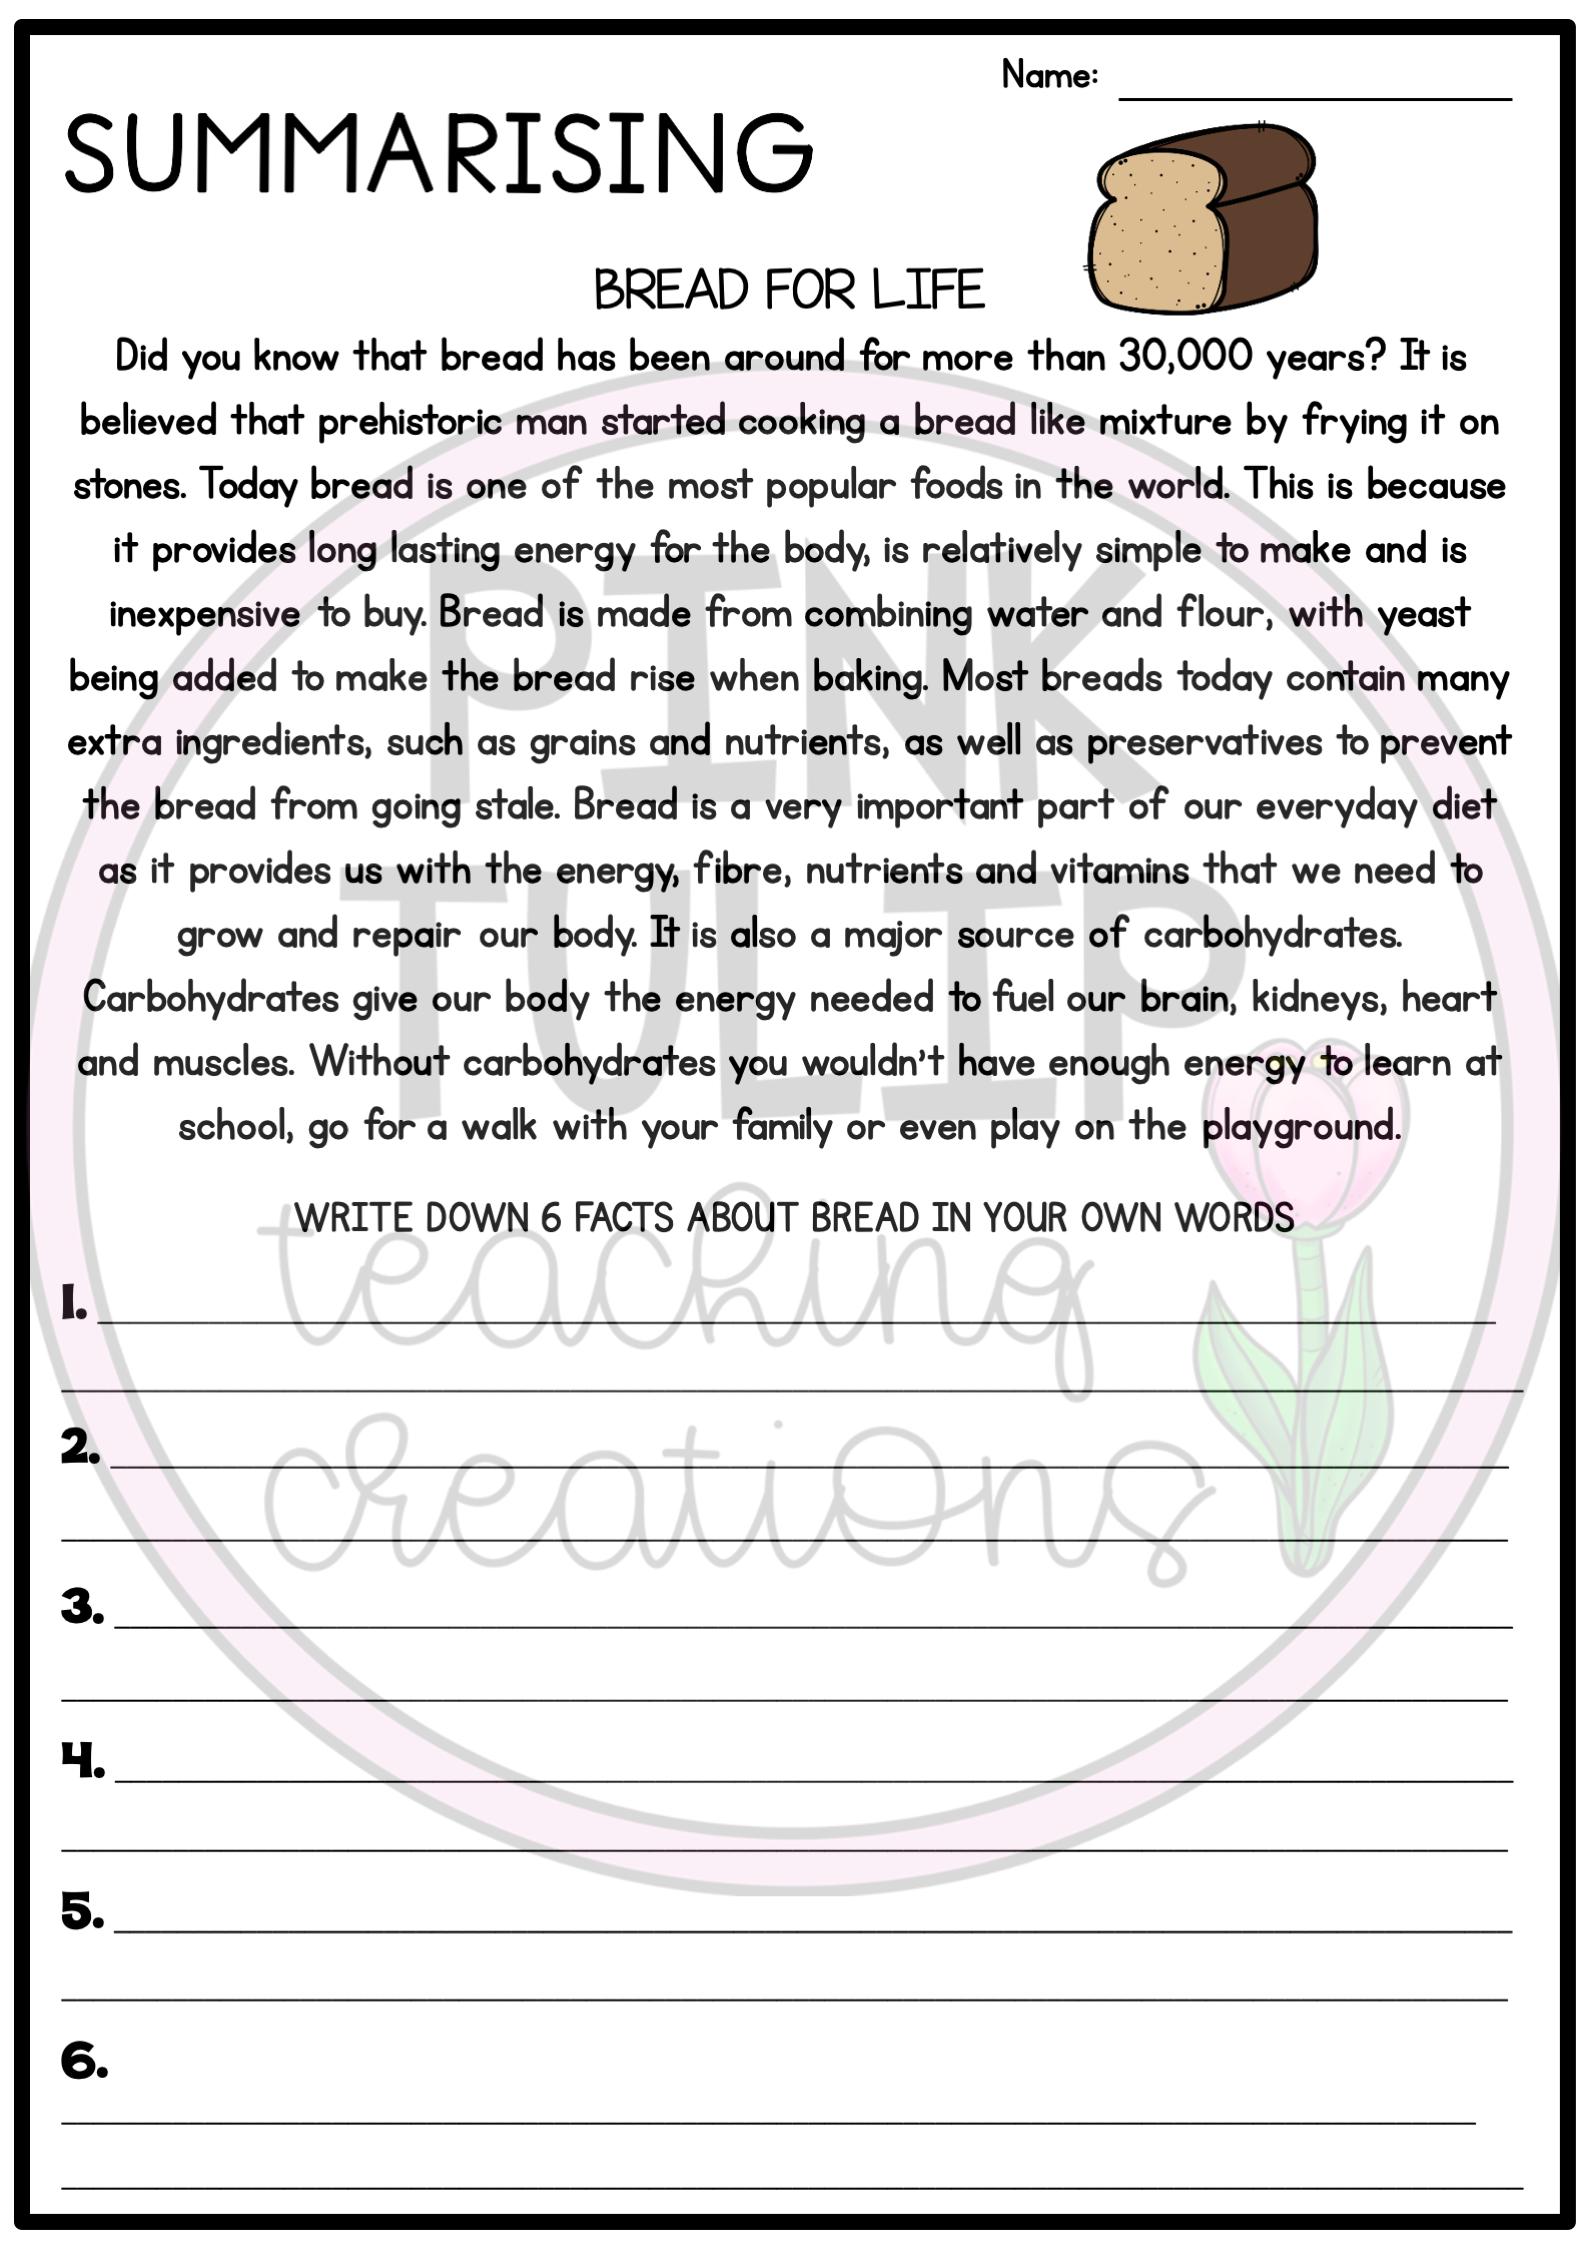 Summarizing Summarising Reading Worksheet Pack Summarizing Reading Reading Worksheets Reading Passages [ 2249 x 1589 Pixel ]